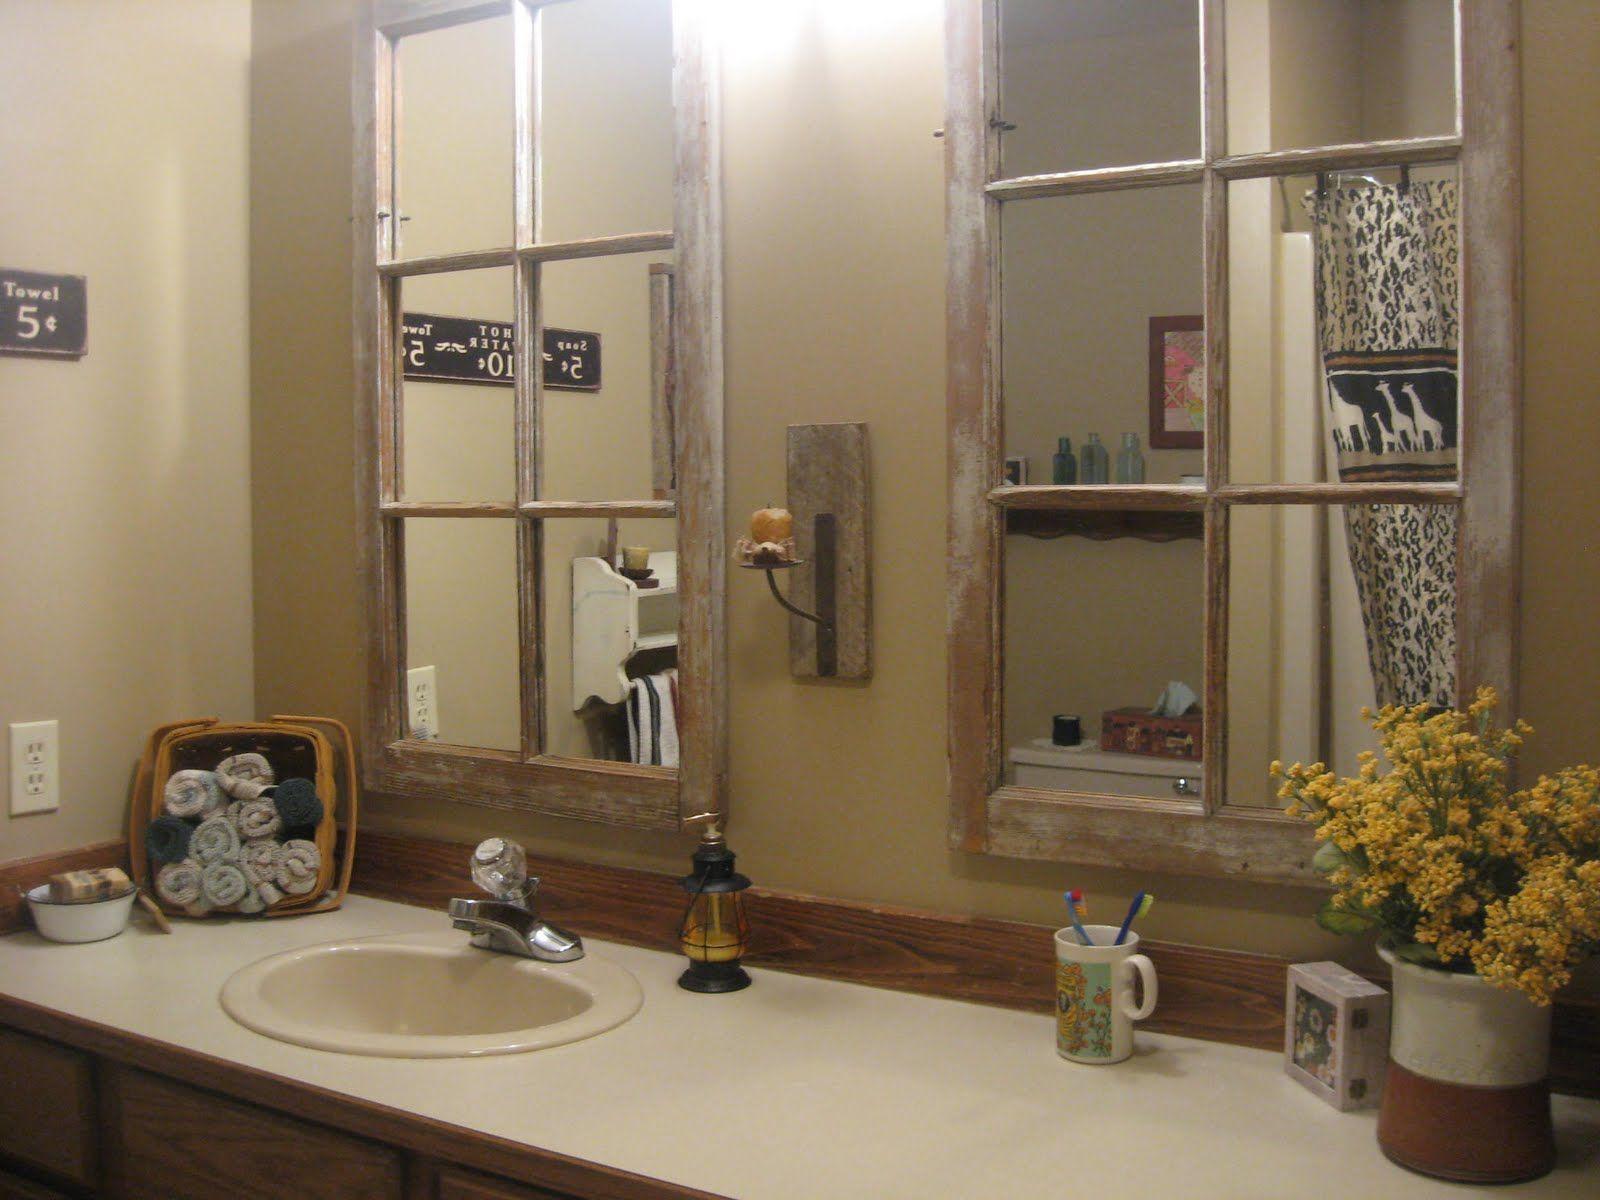 Bathroom Mirror With Old Window